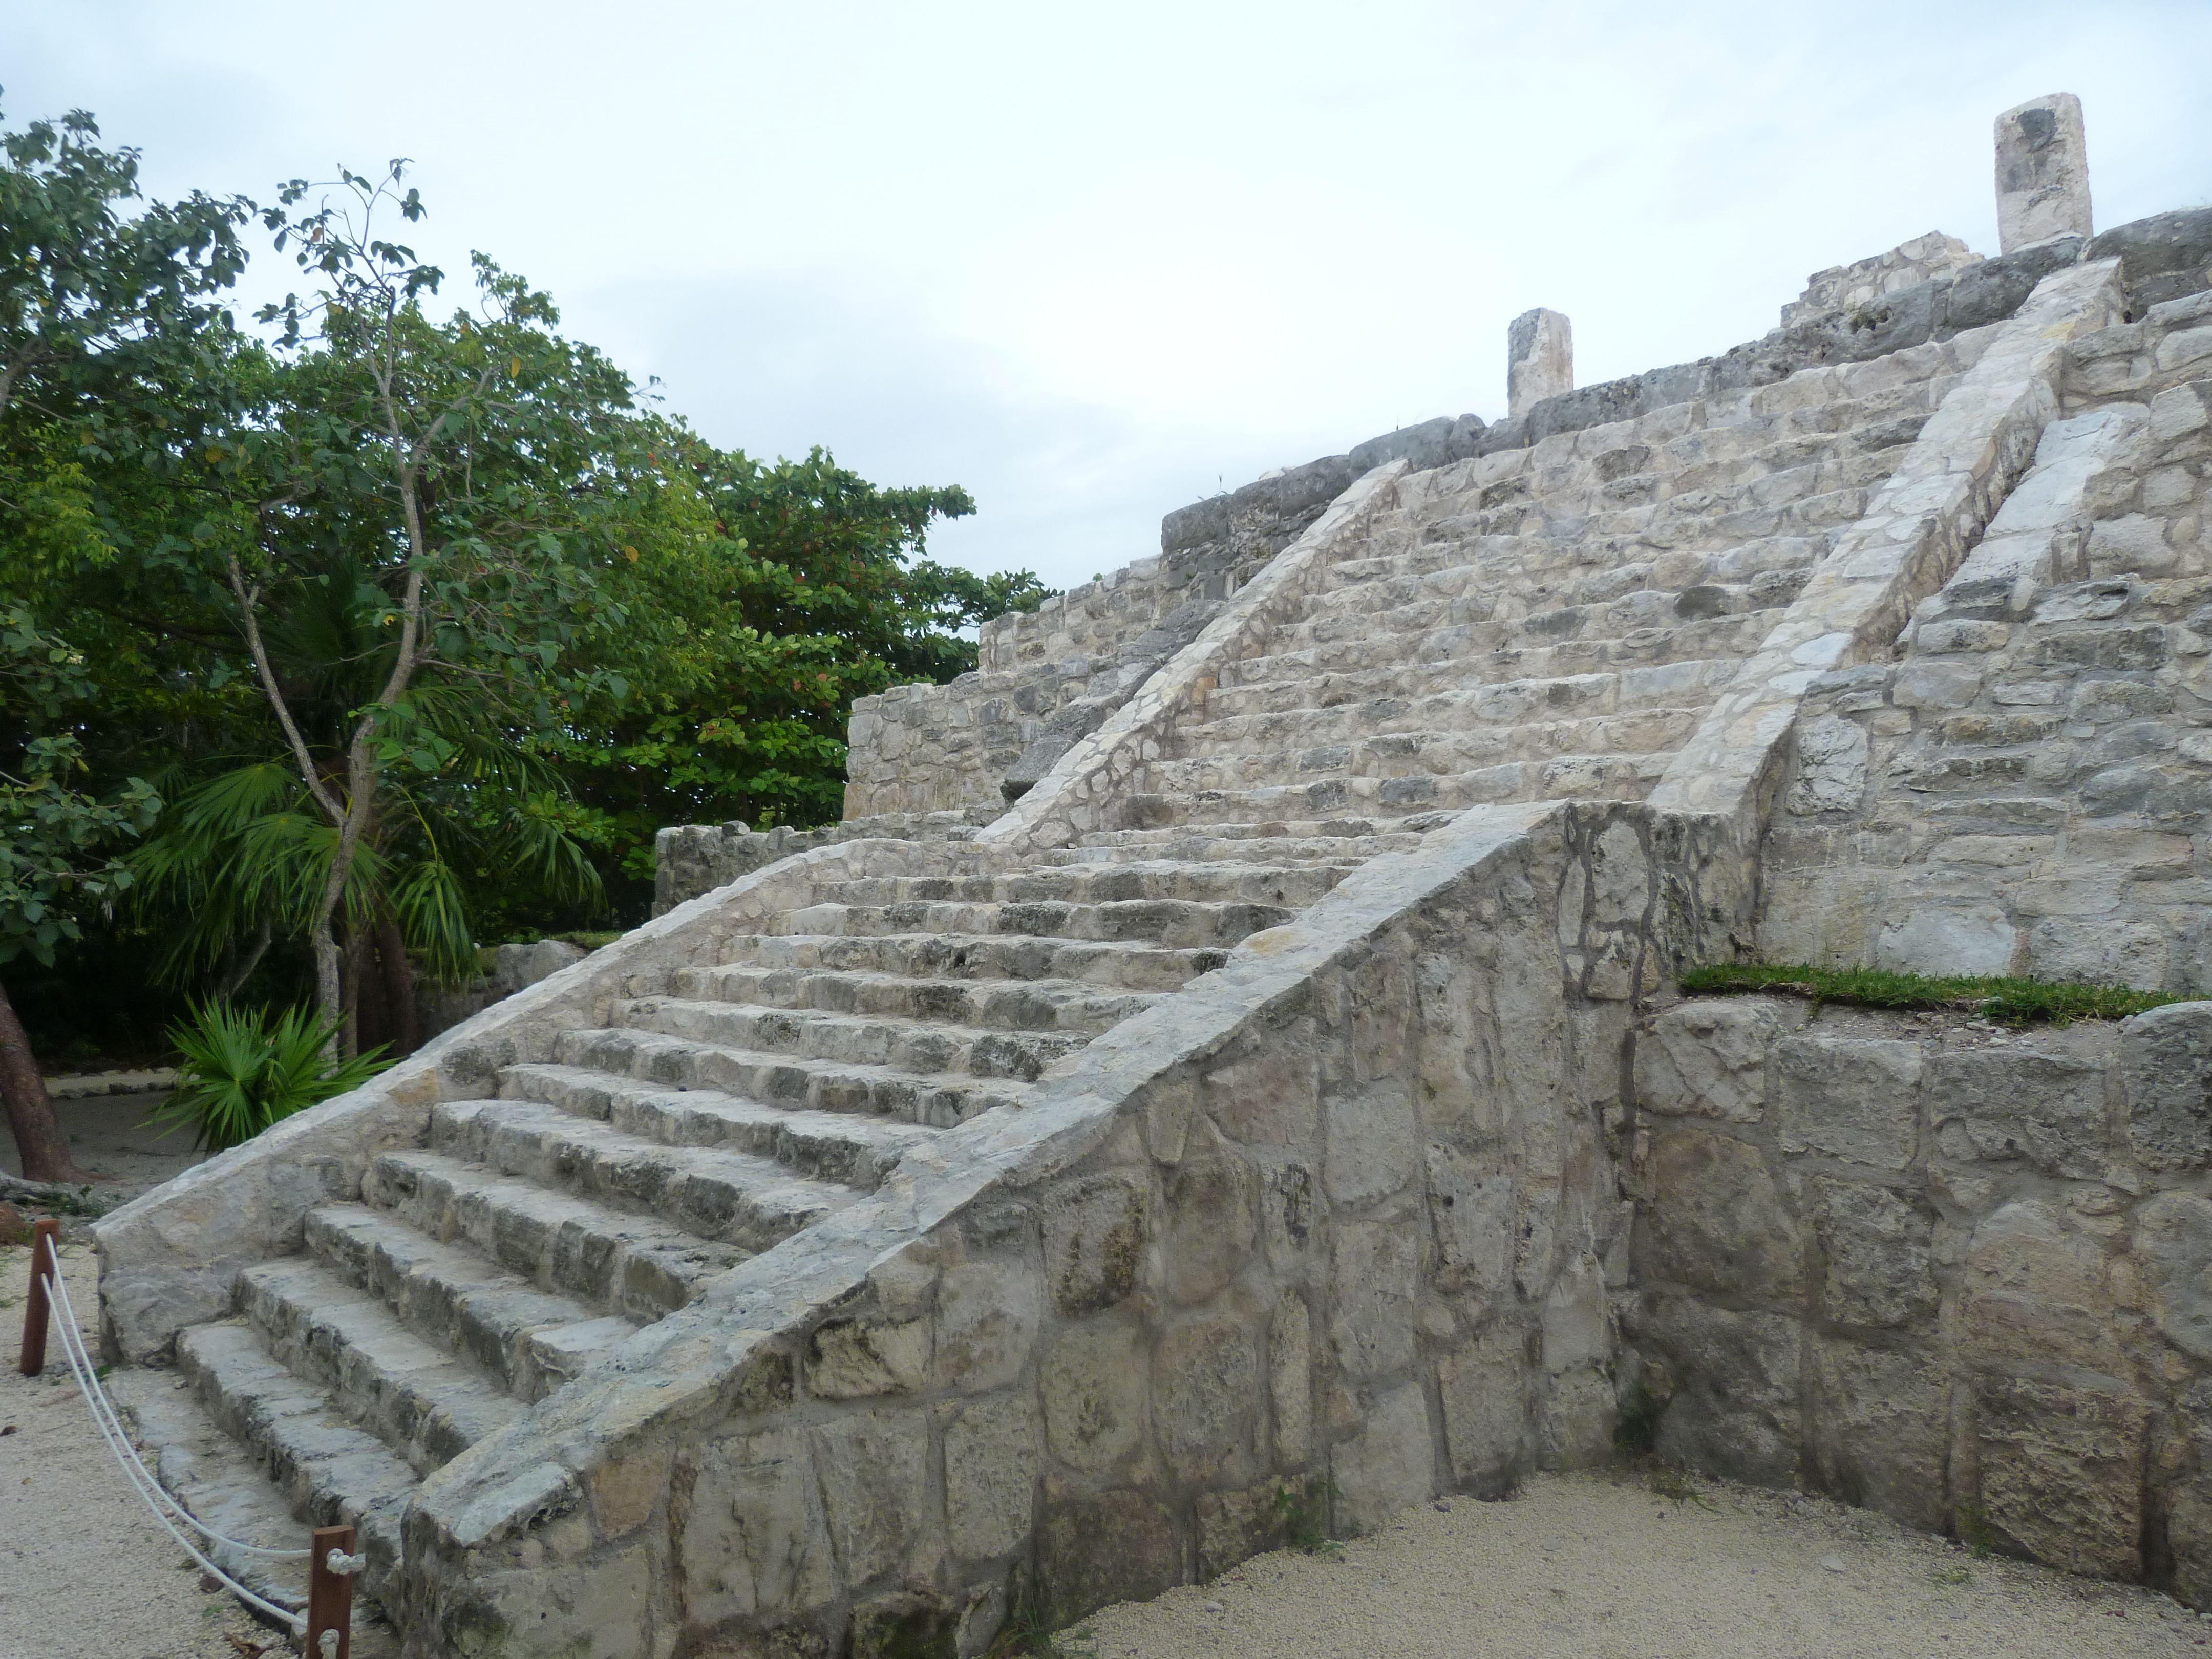 #Cancun #Travel #Guide > http://mayanexplore.com/riviera-maya-destinations/Cancun/Cancun-Travel-Guide #ThrowBackThursday